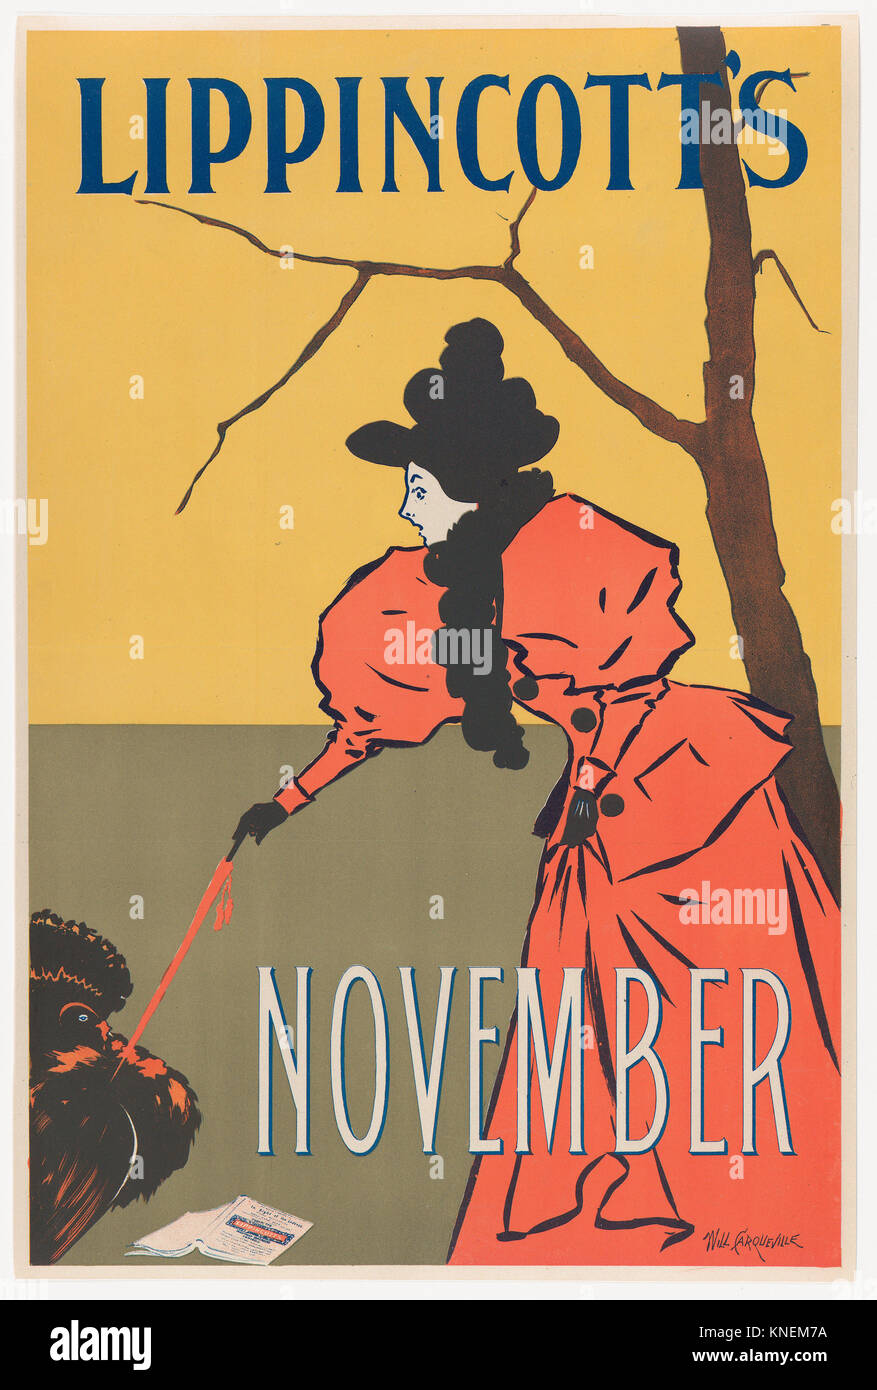 Lippincott's: November. Artist: William L. Carqueville (American, Chicago, Illinois 1871-1946); Publisher: J. - Stock Image